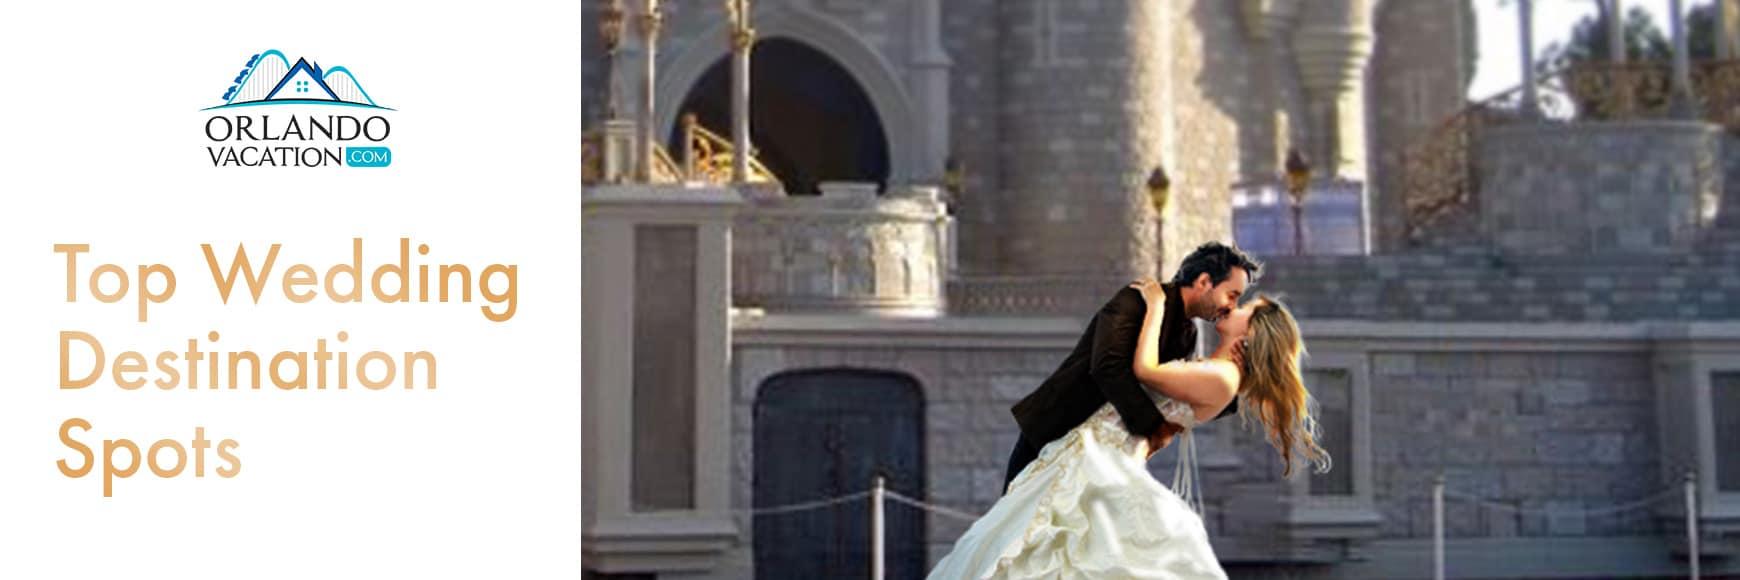 Top Wedding Destination Spots